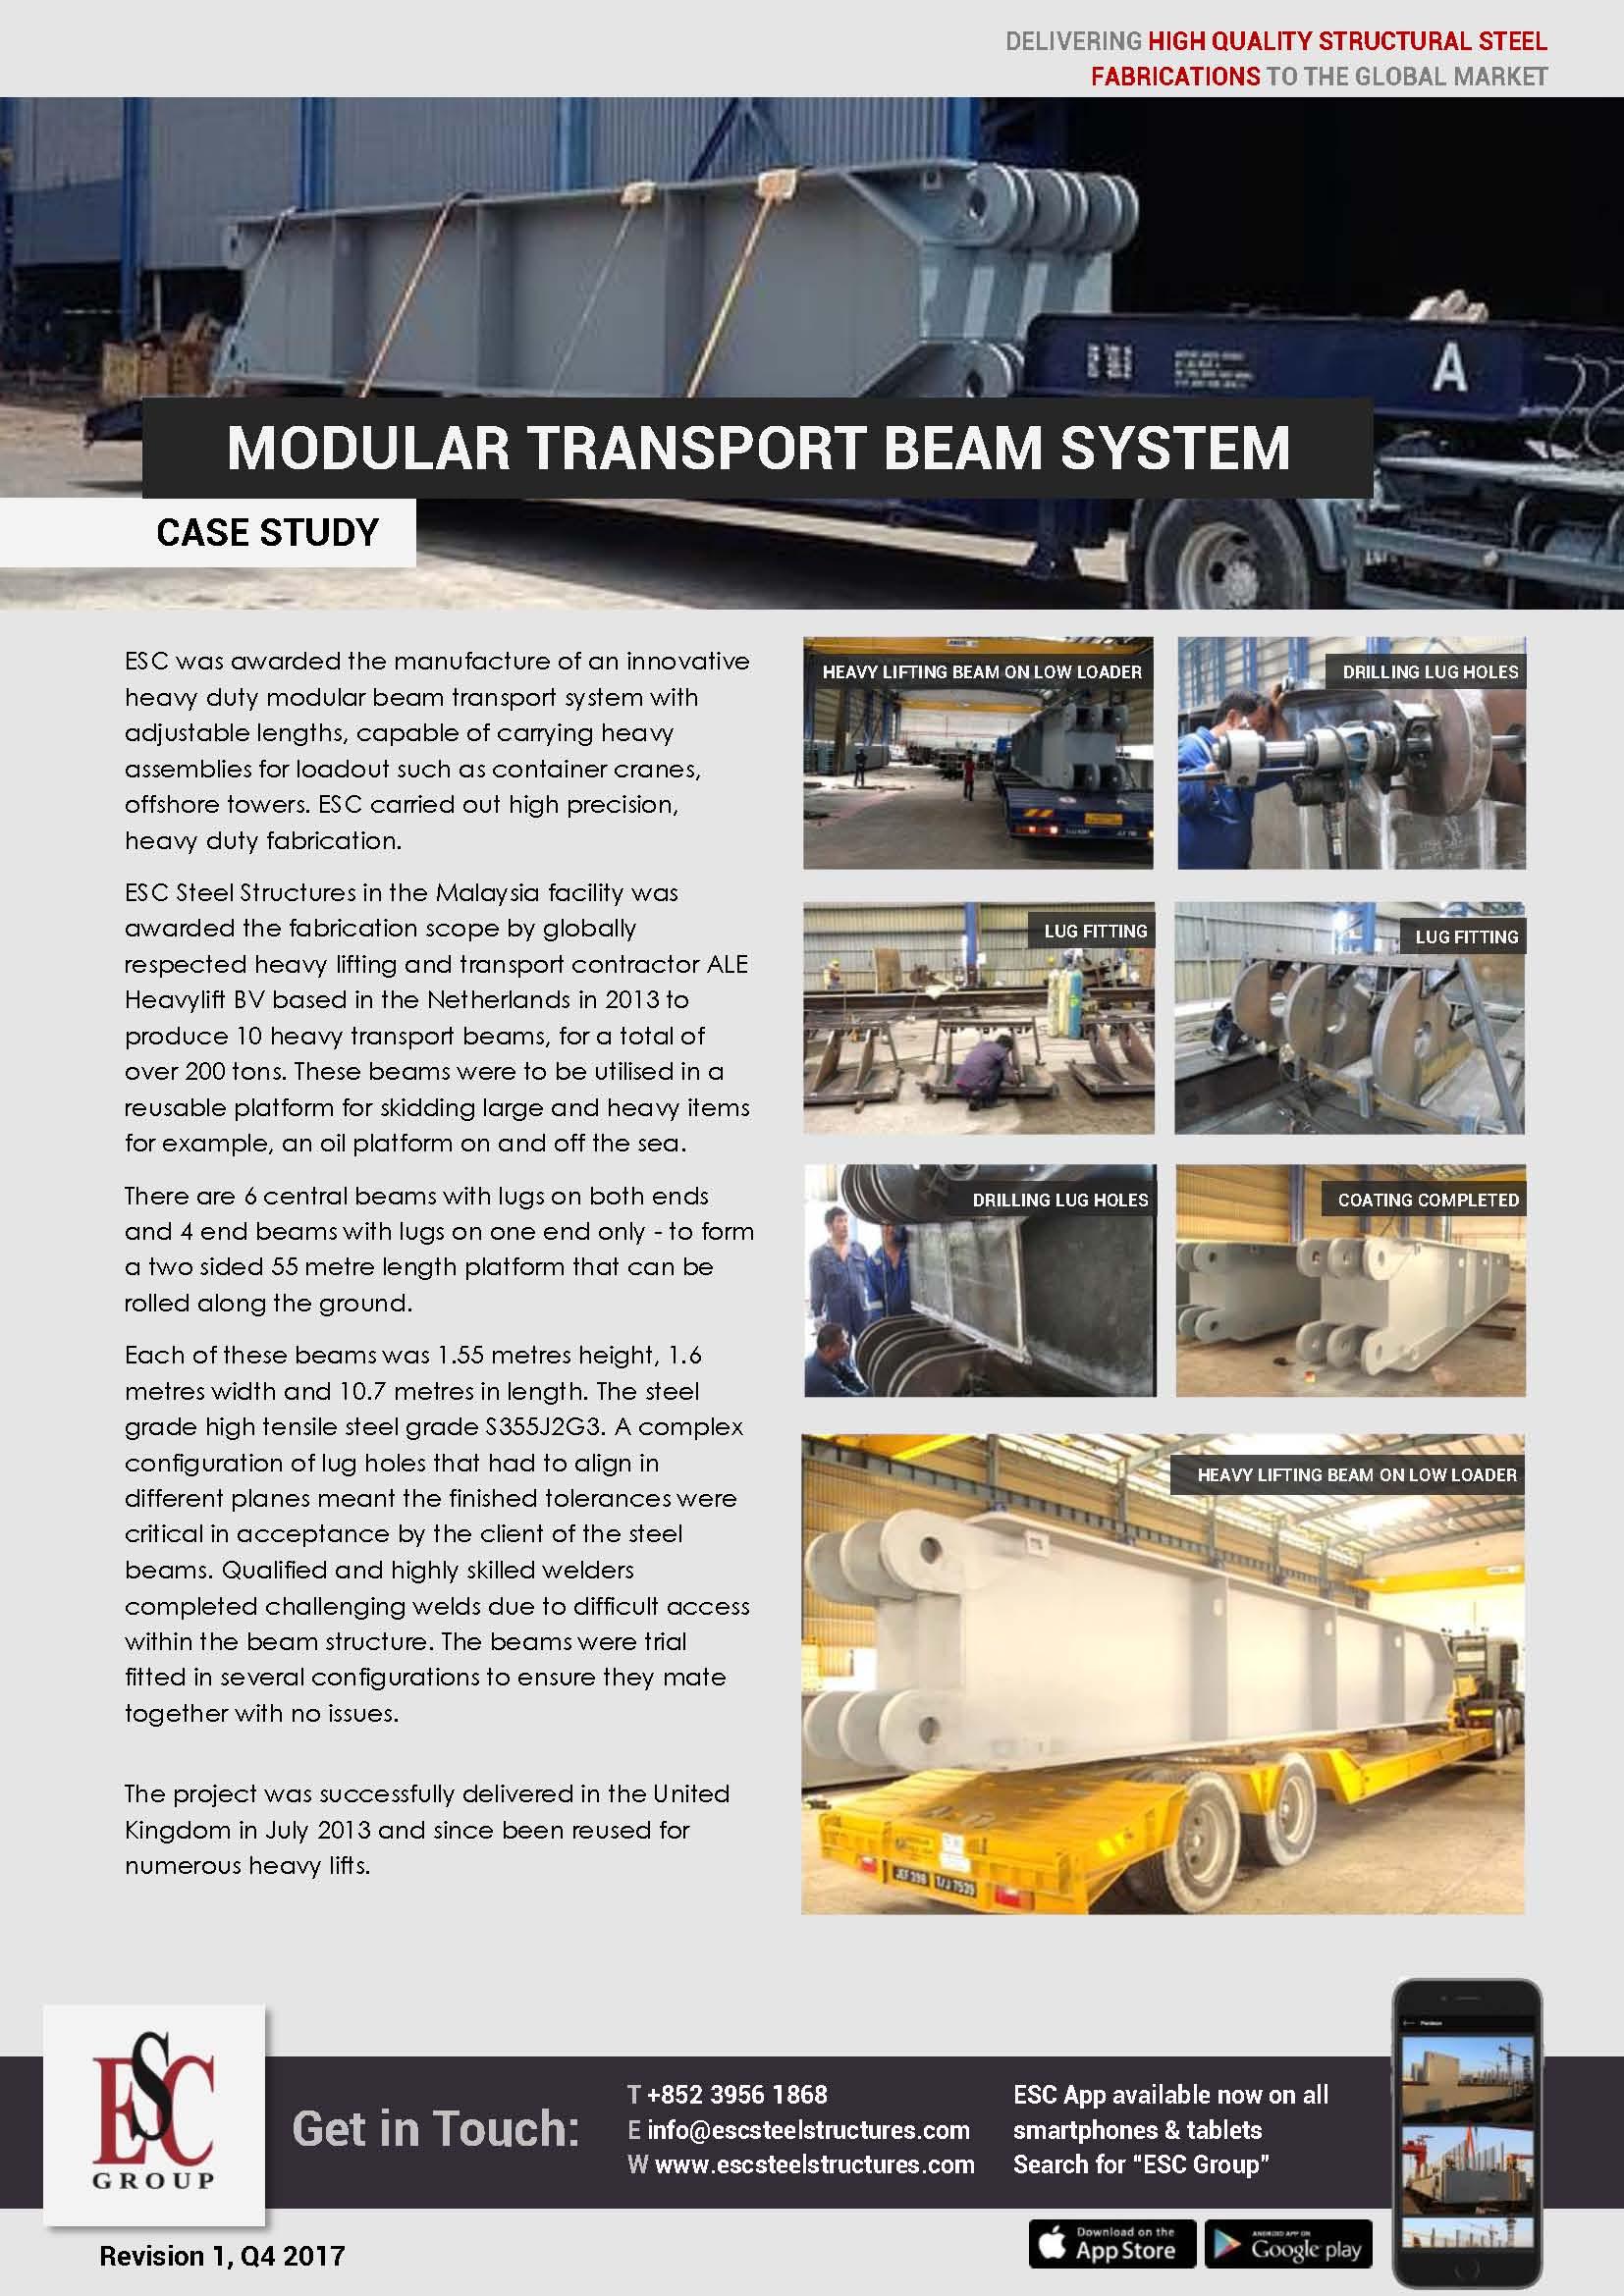 Modular Transport Beam System